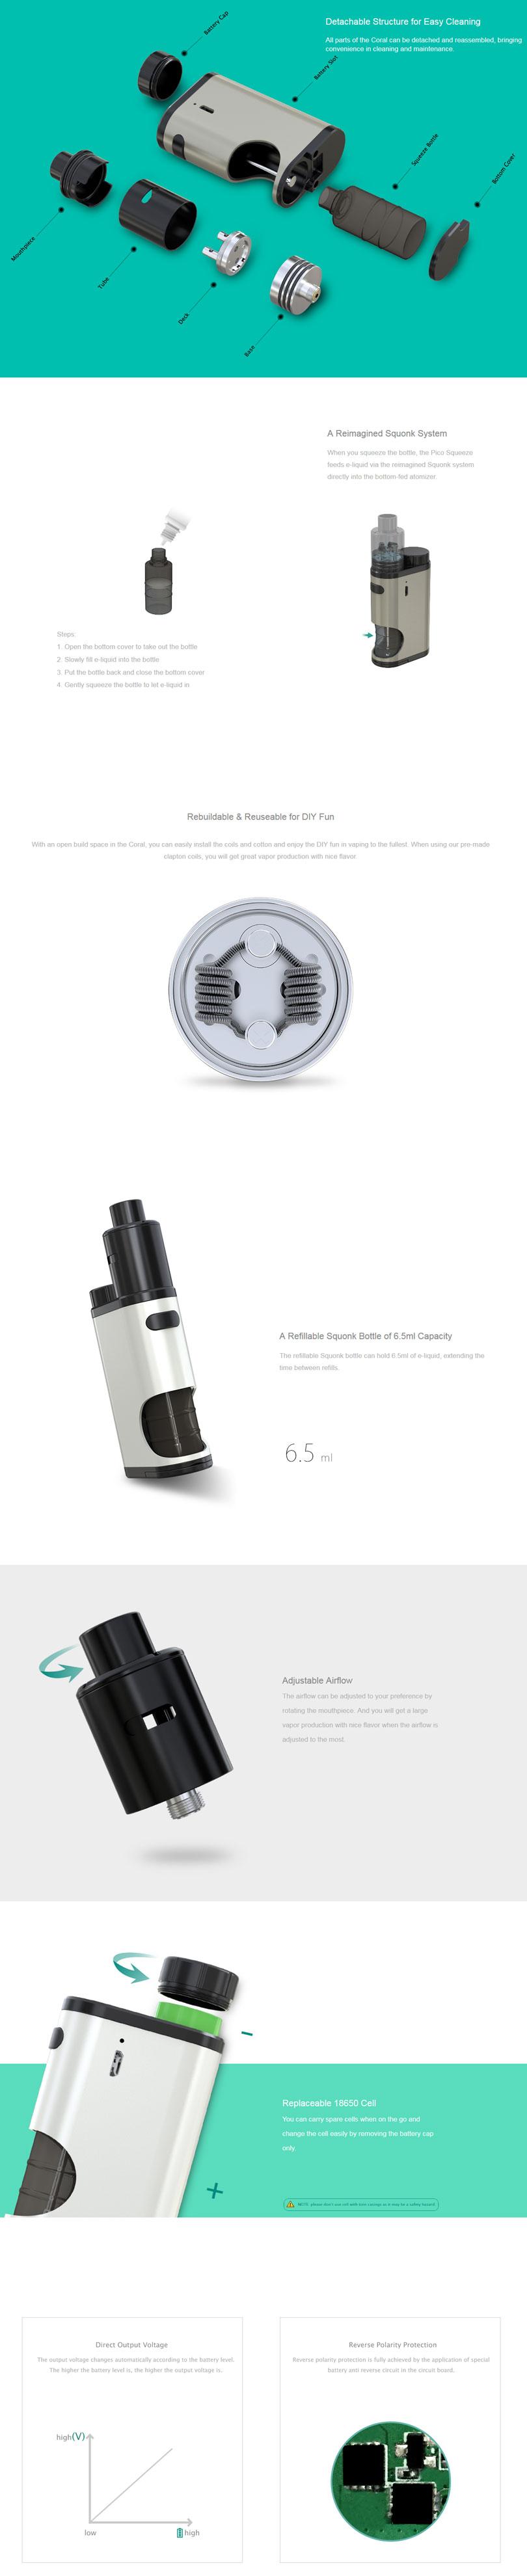 Eleaf-Pico-Squeeze-Features